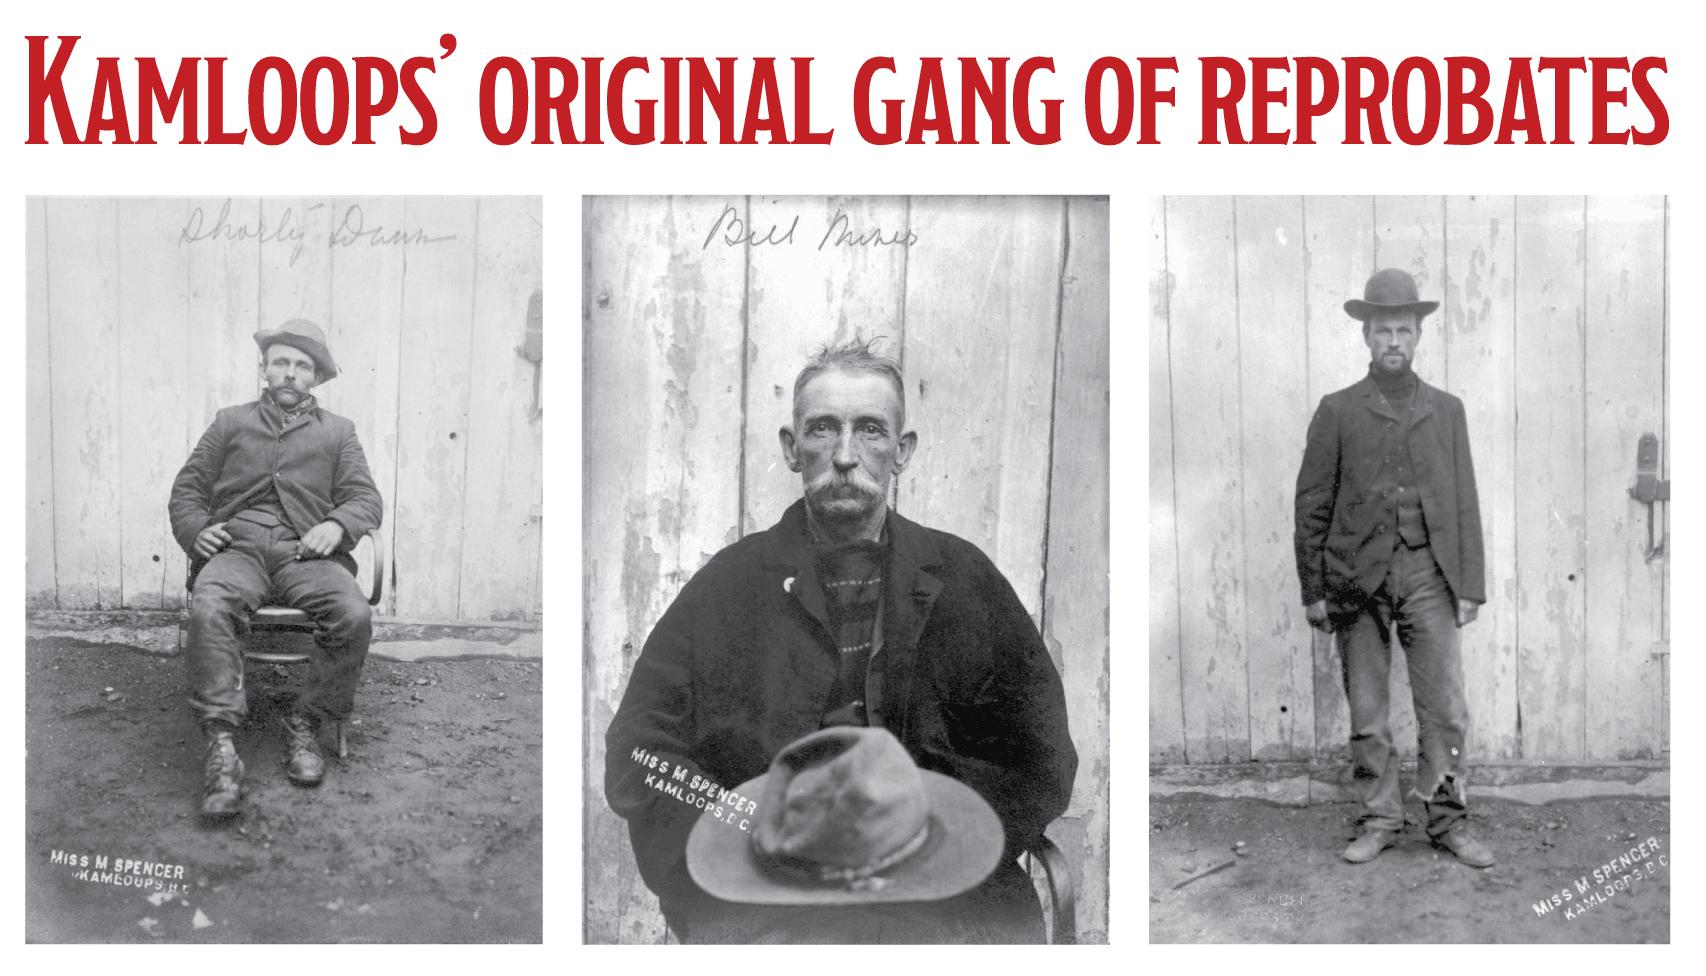 Kamloops-Reprobates-V01.png